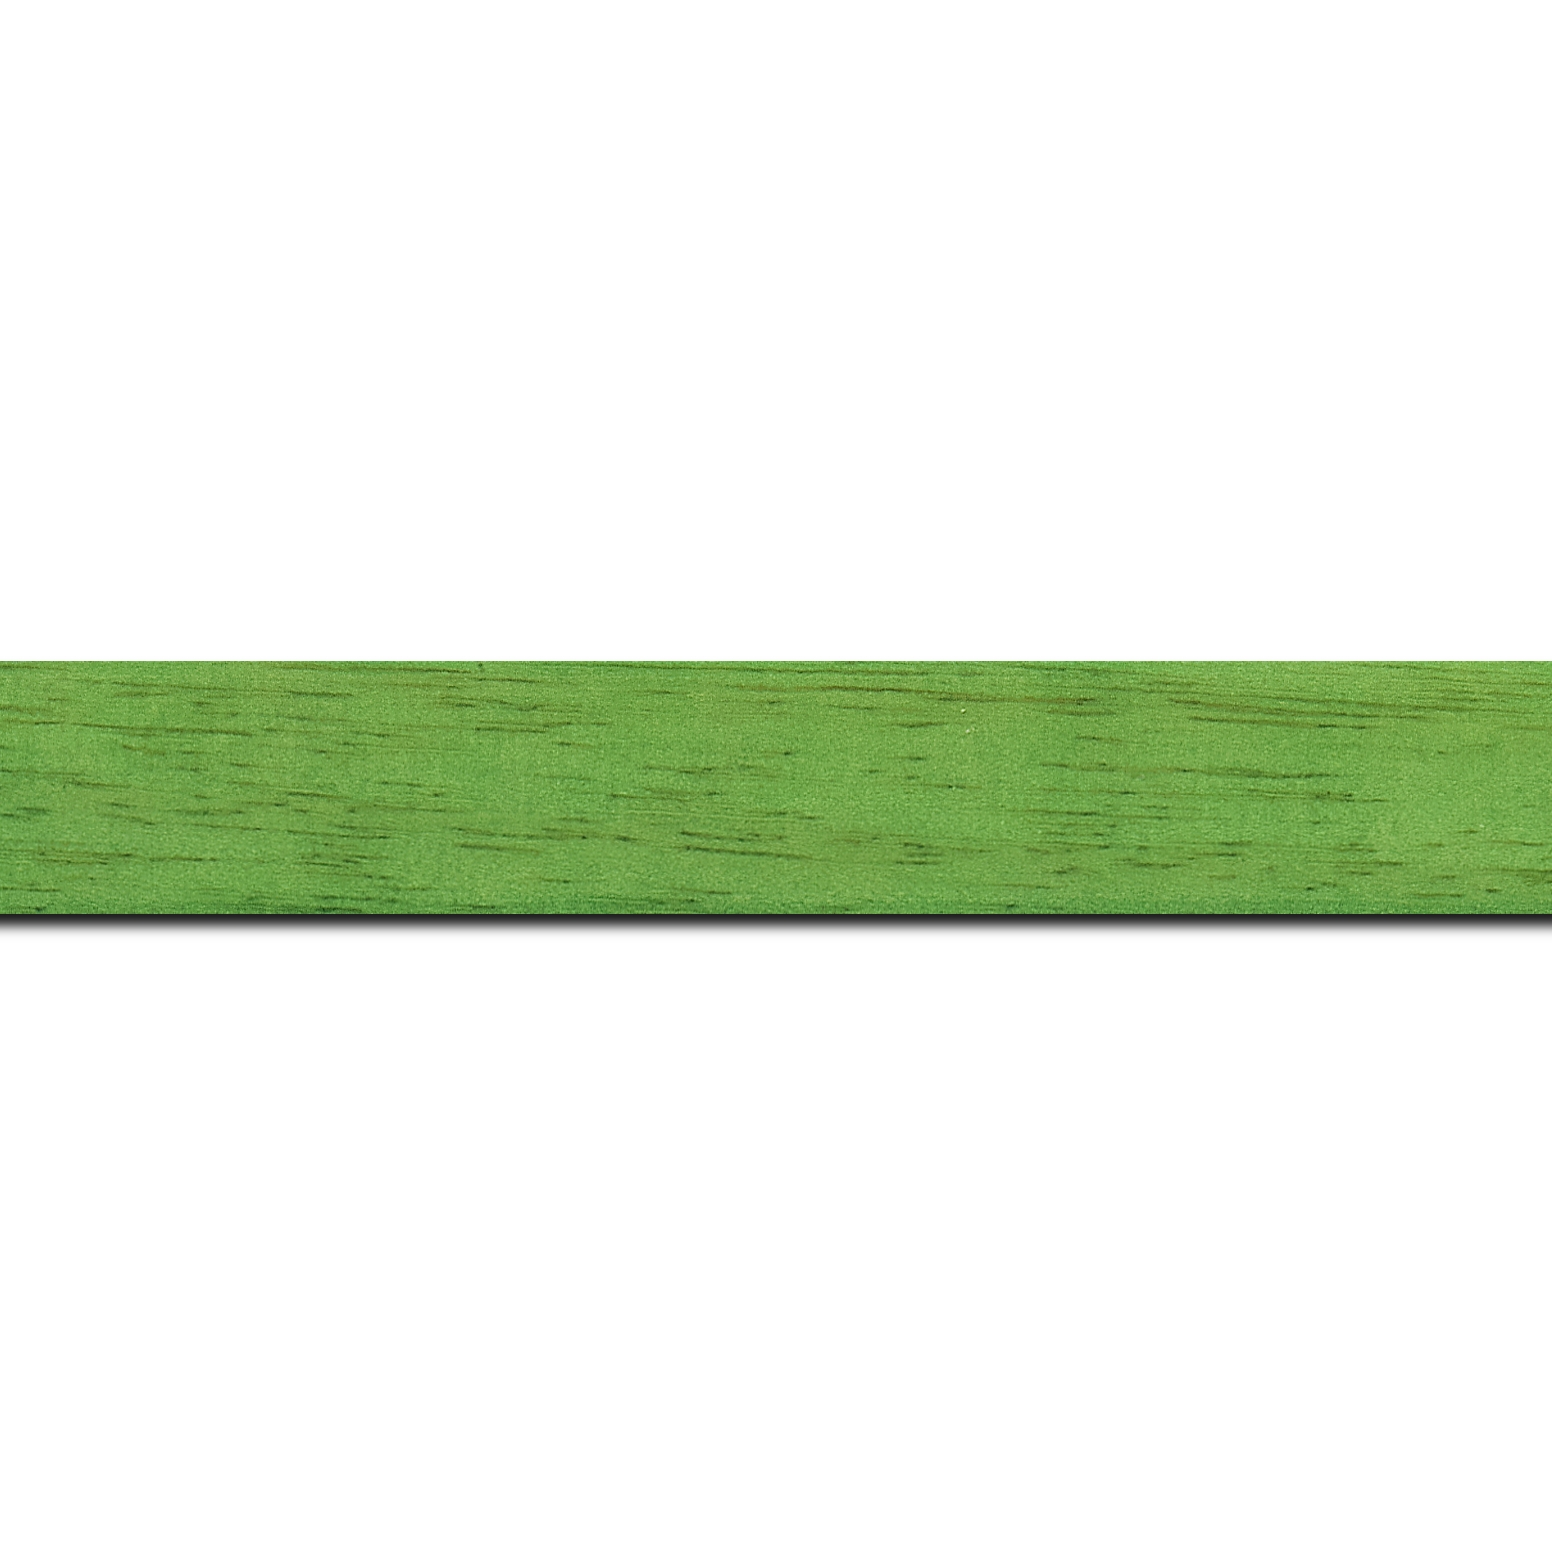 cadre bois vert pas cher cadre photo bois vert destock cadre. Black Bedroom Furniture Sets. Home Design Ideas